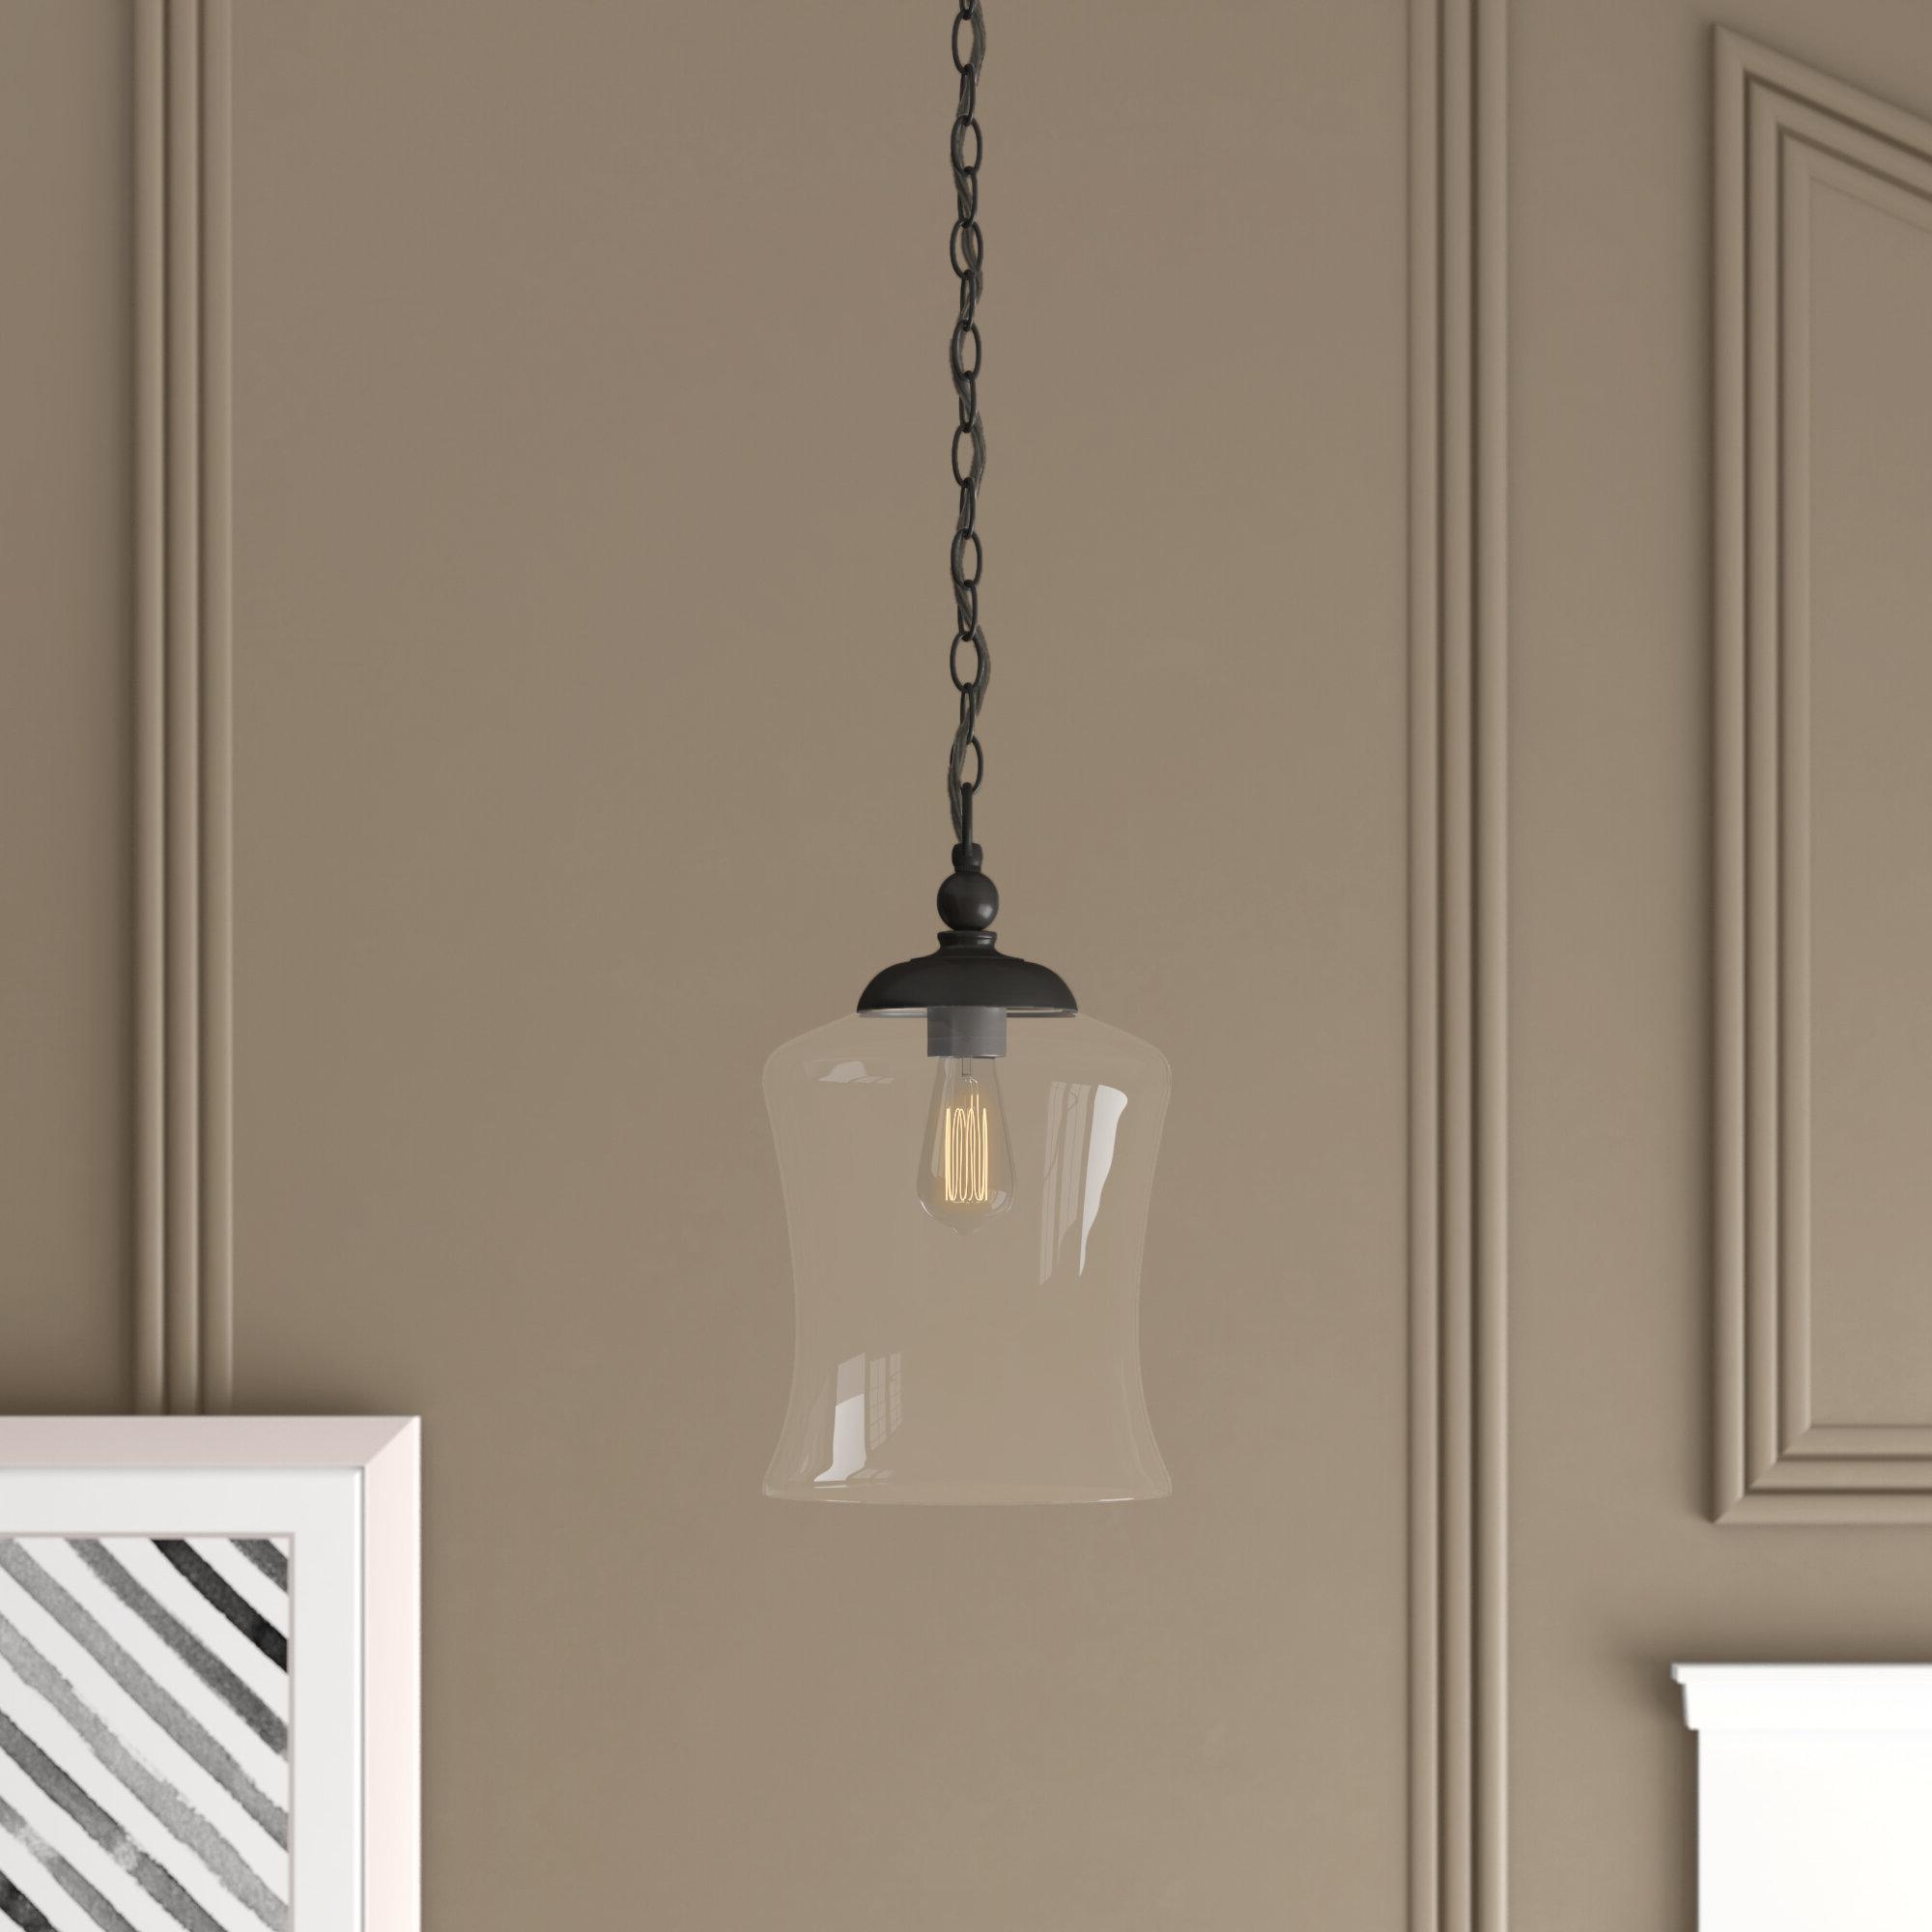 Wentzville 1 Light Single Bell Pendants Intended For Most Current Wentzville 1 Light Single Bell Pendant (View 16 of 20)